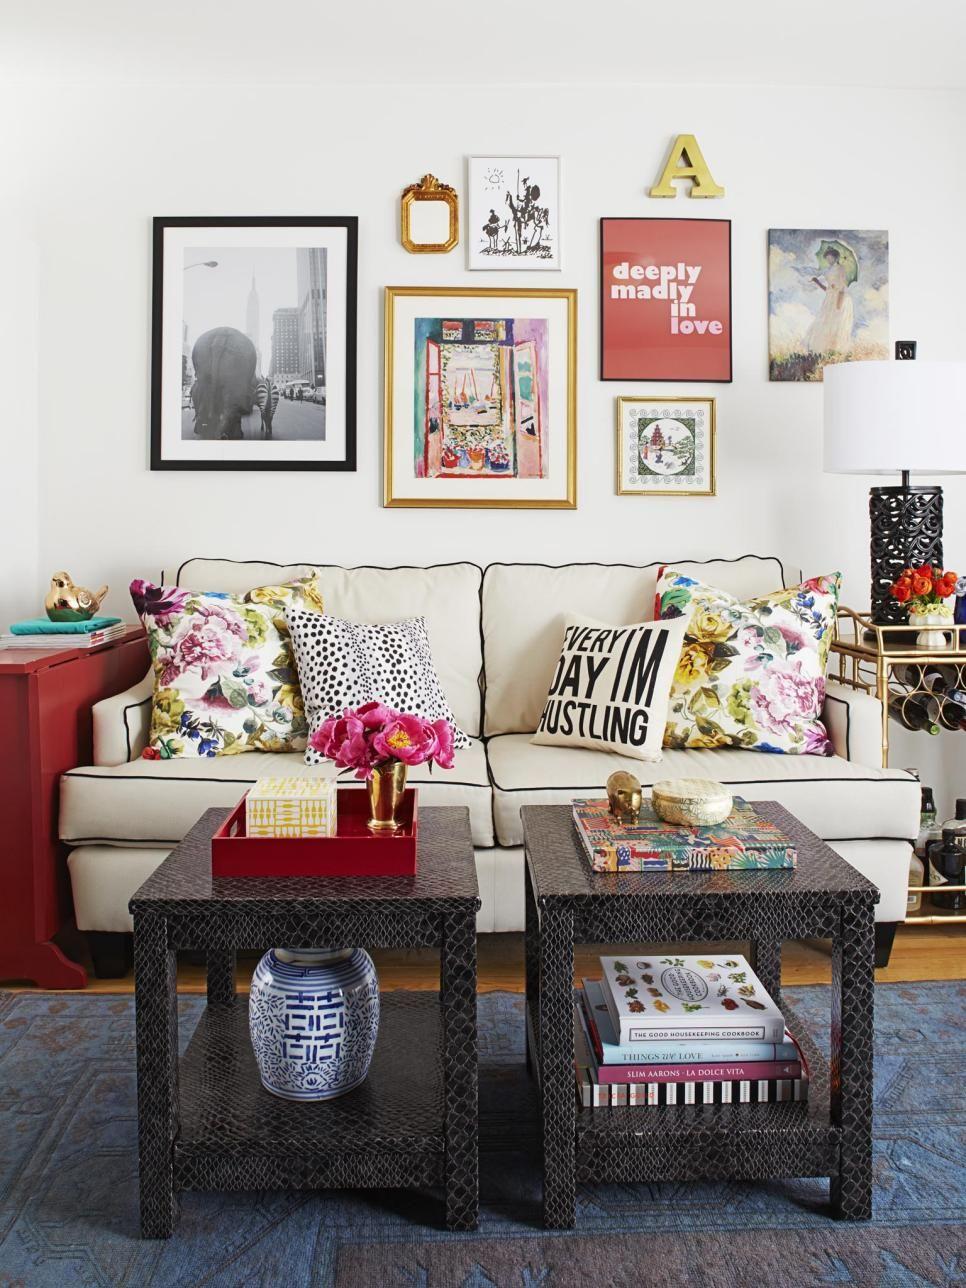 Small Space Design For Living Rooms Home Living Room Home Decor Inspiration Home Decor